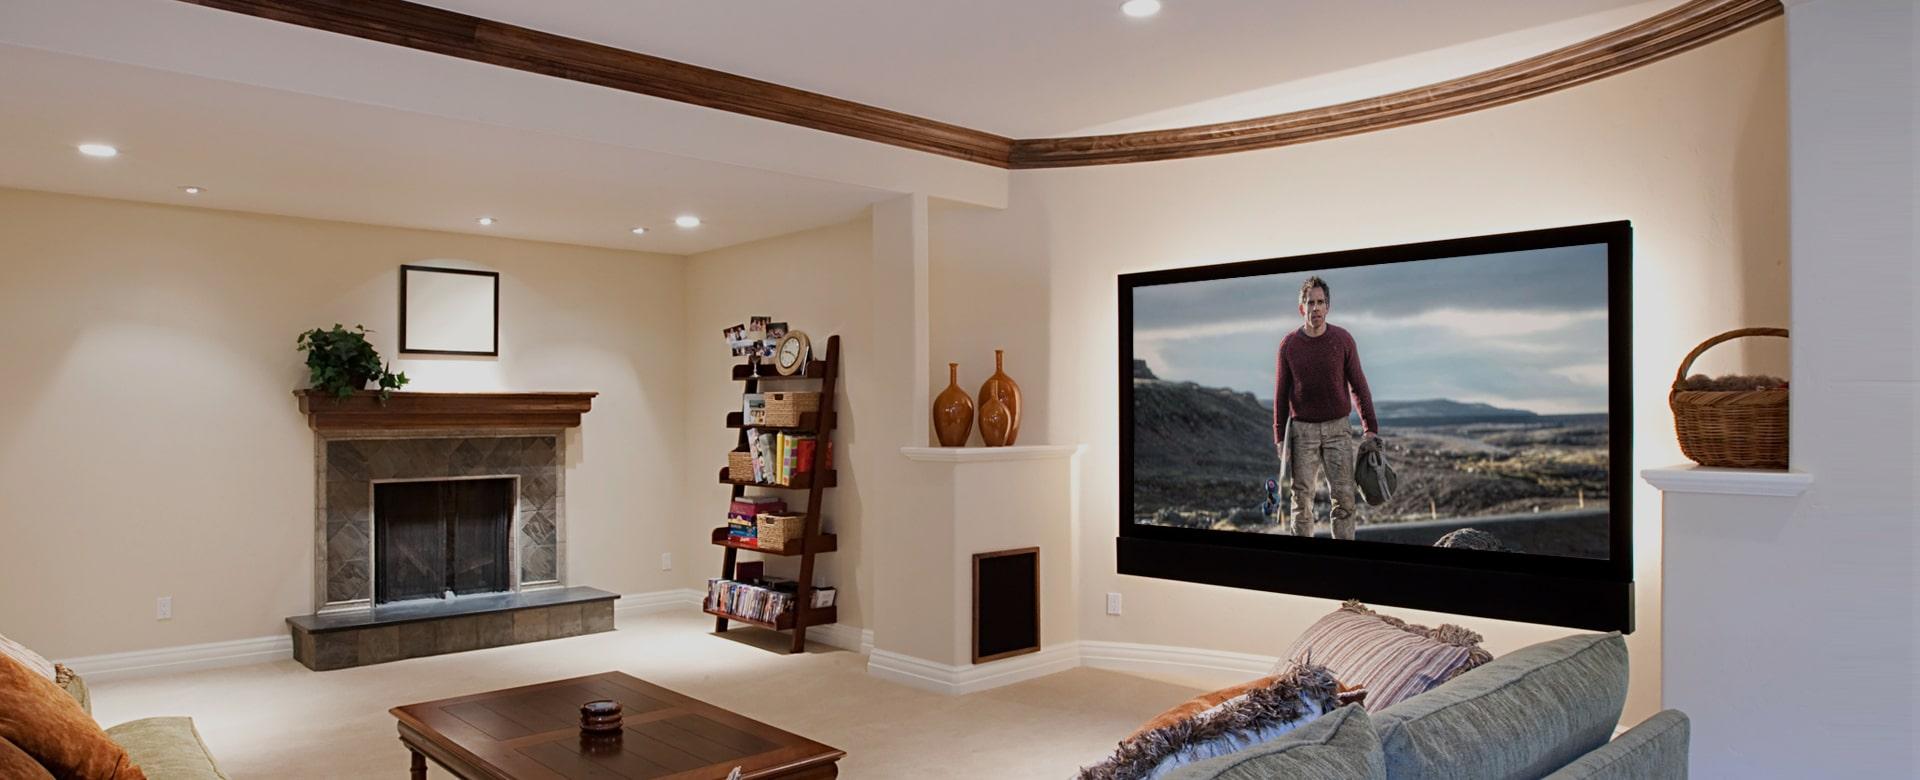 Tv Mounting Services Surround Sound Installation Dallas Frisco